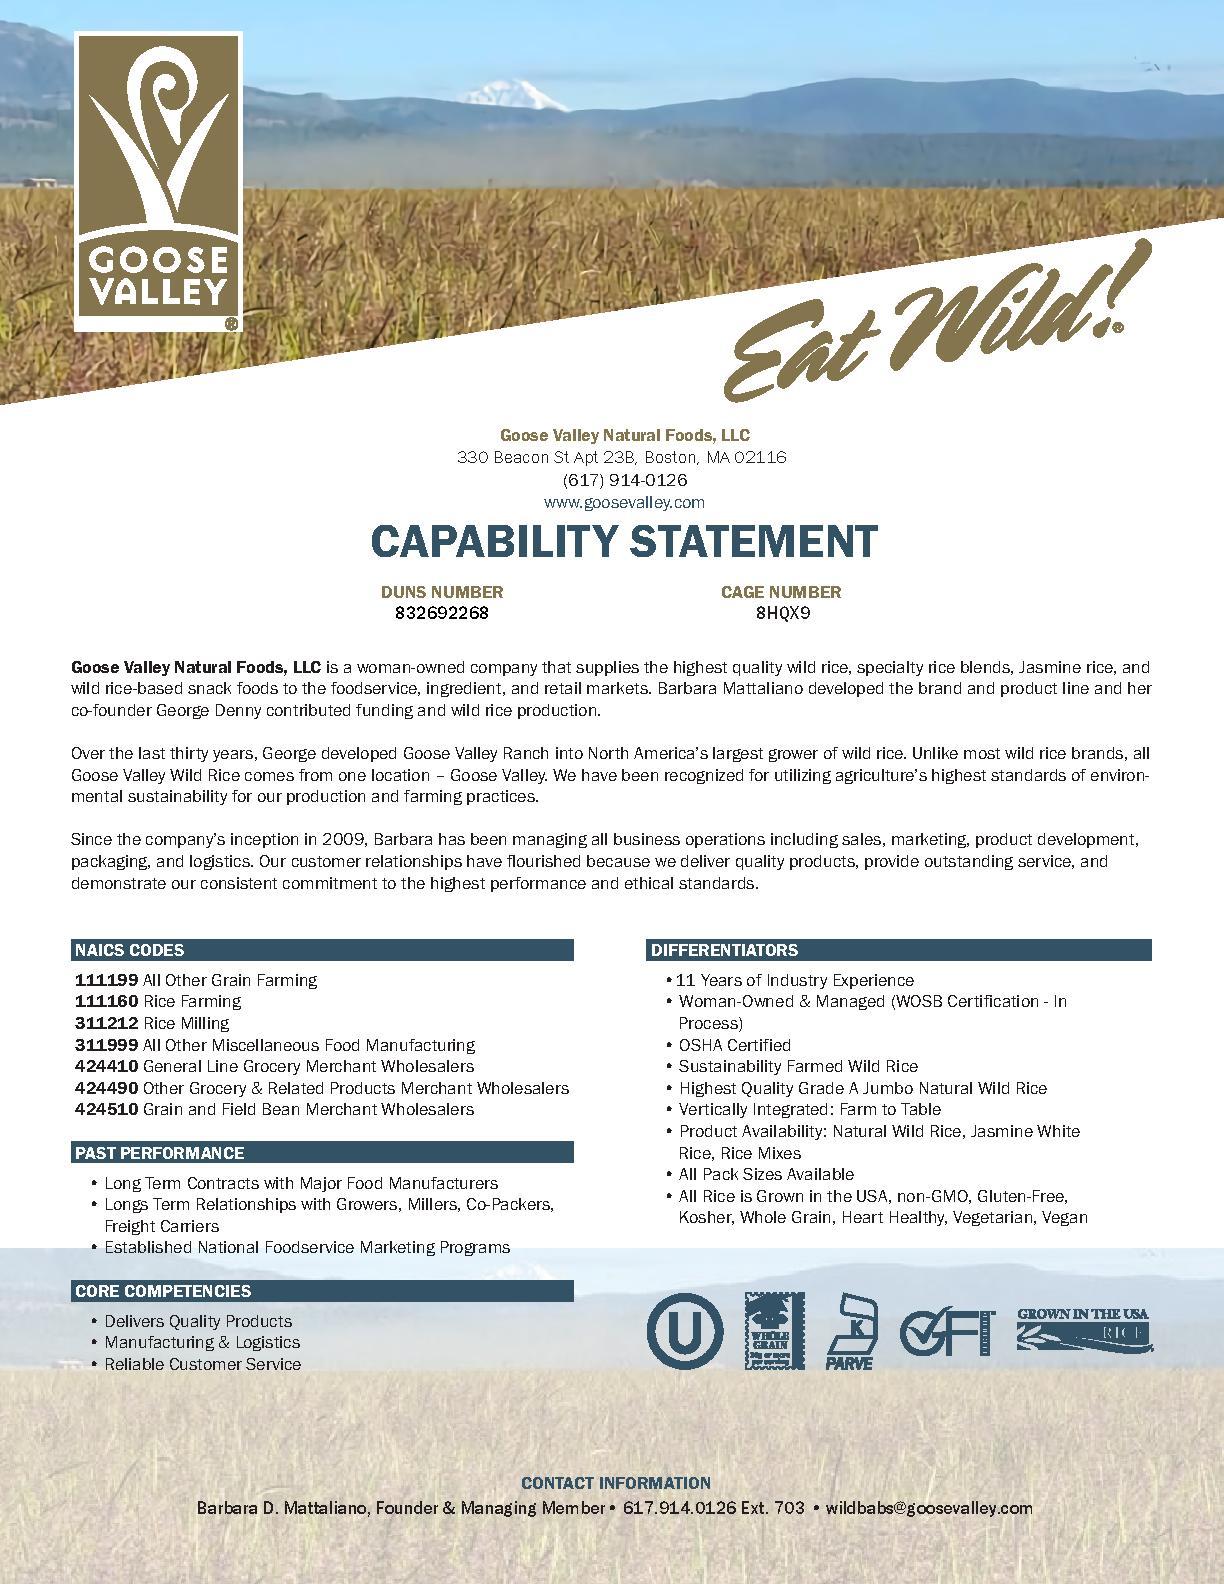 Gvnf capability statement 062920